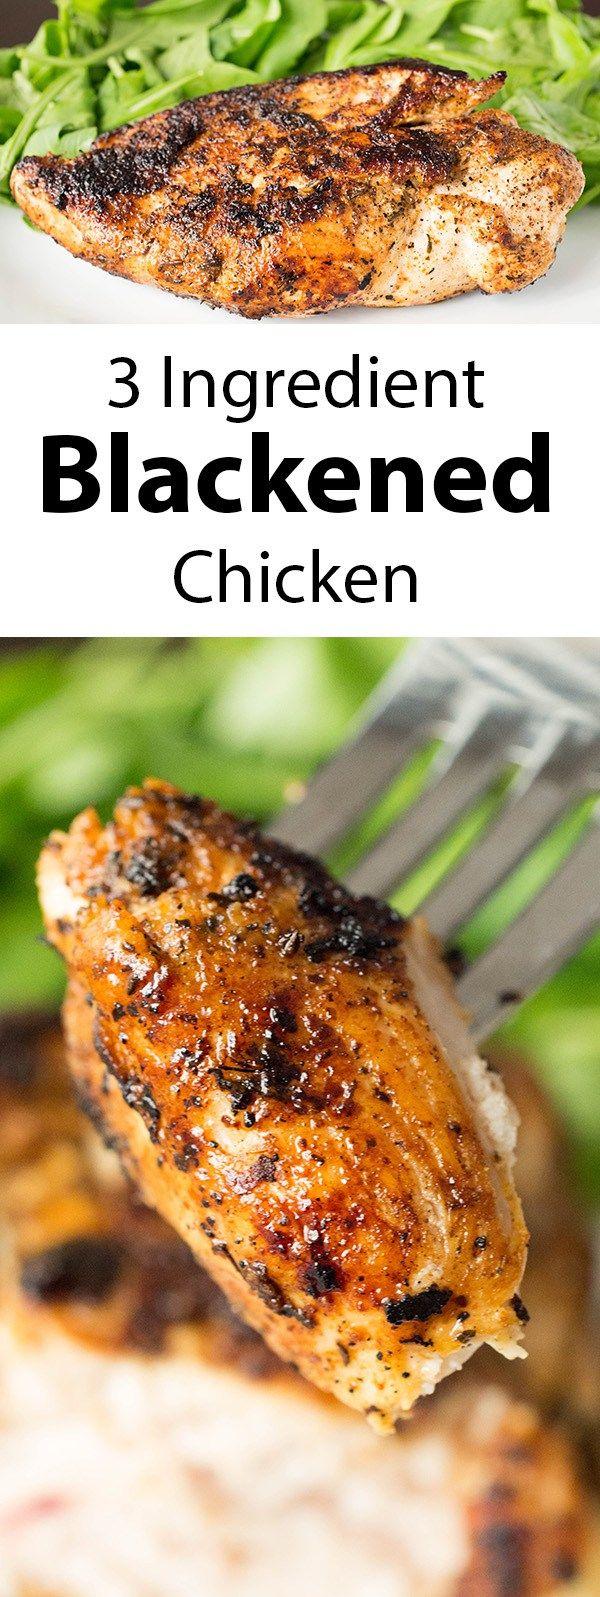 One of our favorite weeknight meals: easy, three ingredient blackened chicken.